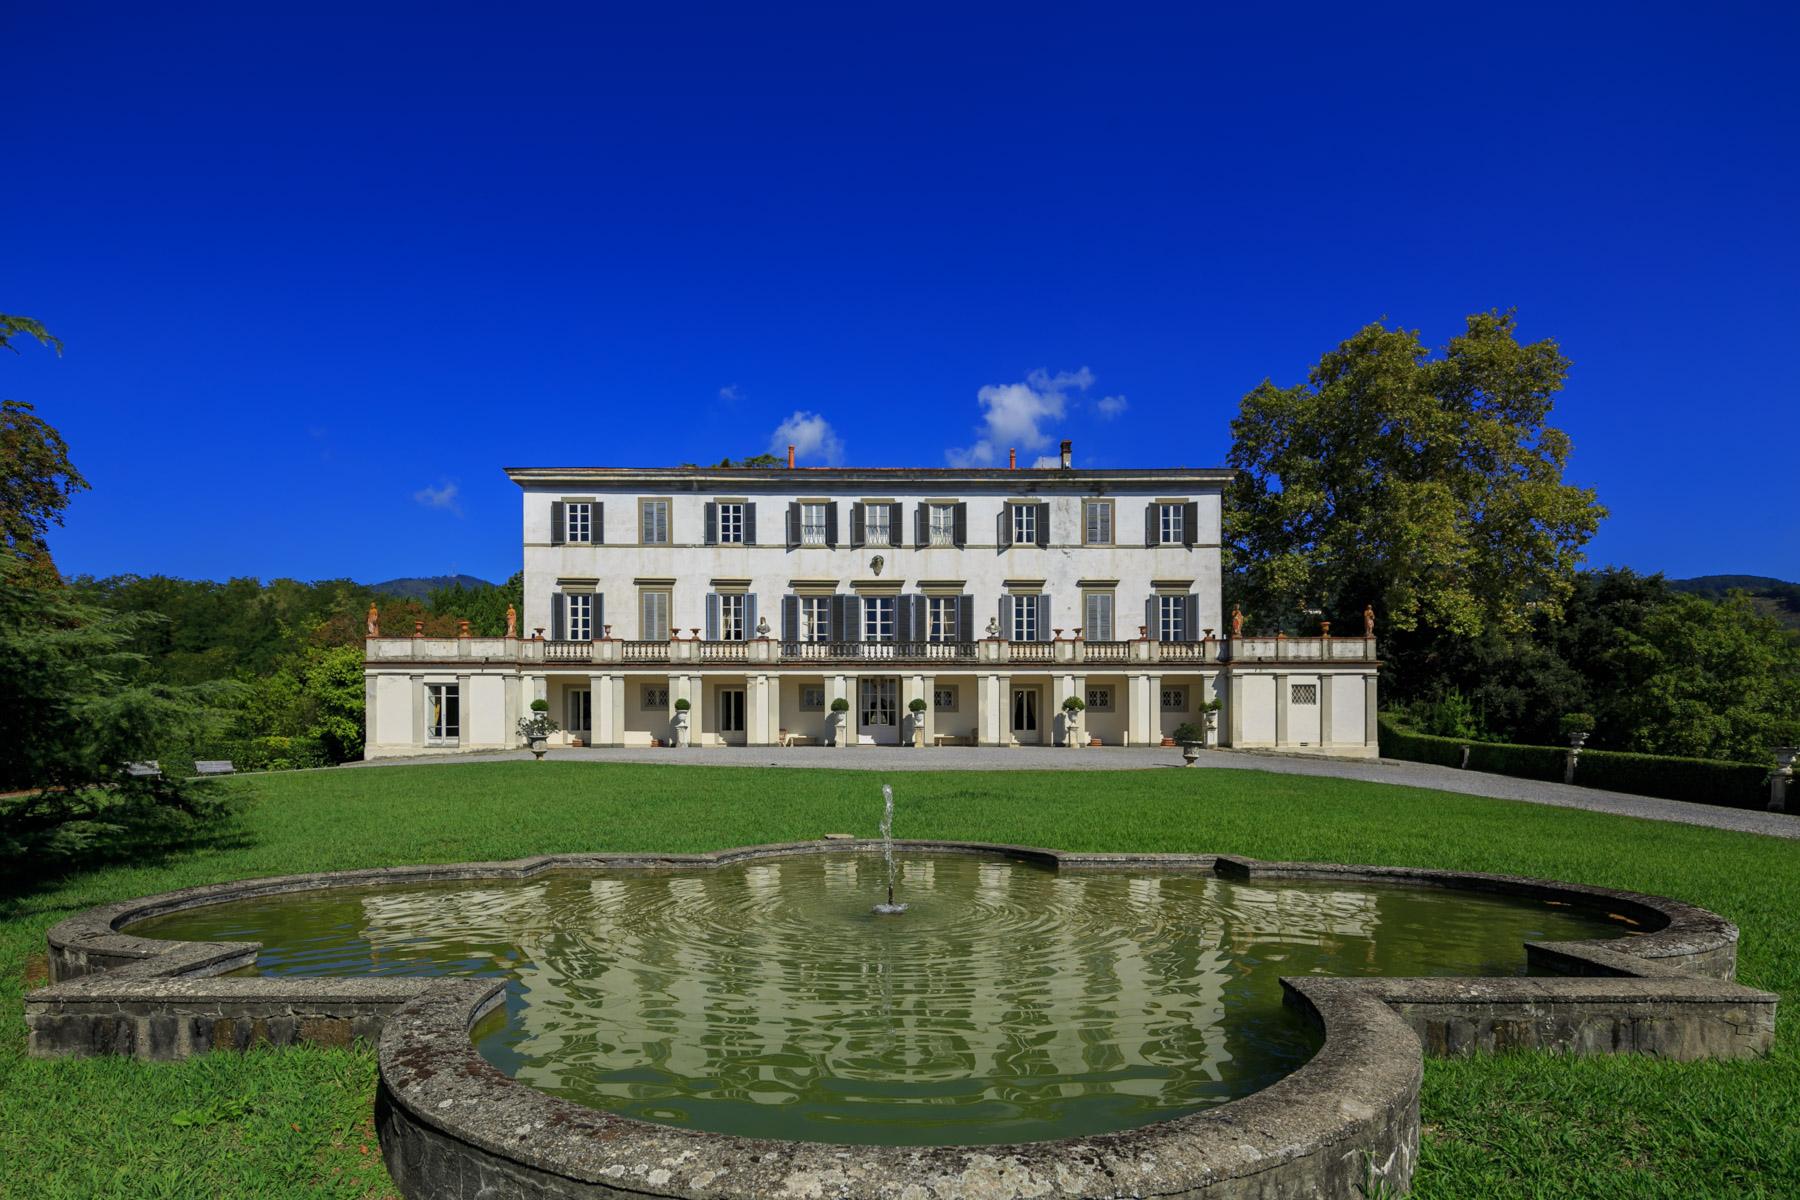 Villa in Vendita a Capannori: 5 locali, 4360 mq - Foto 2